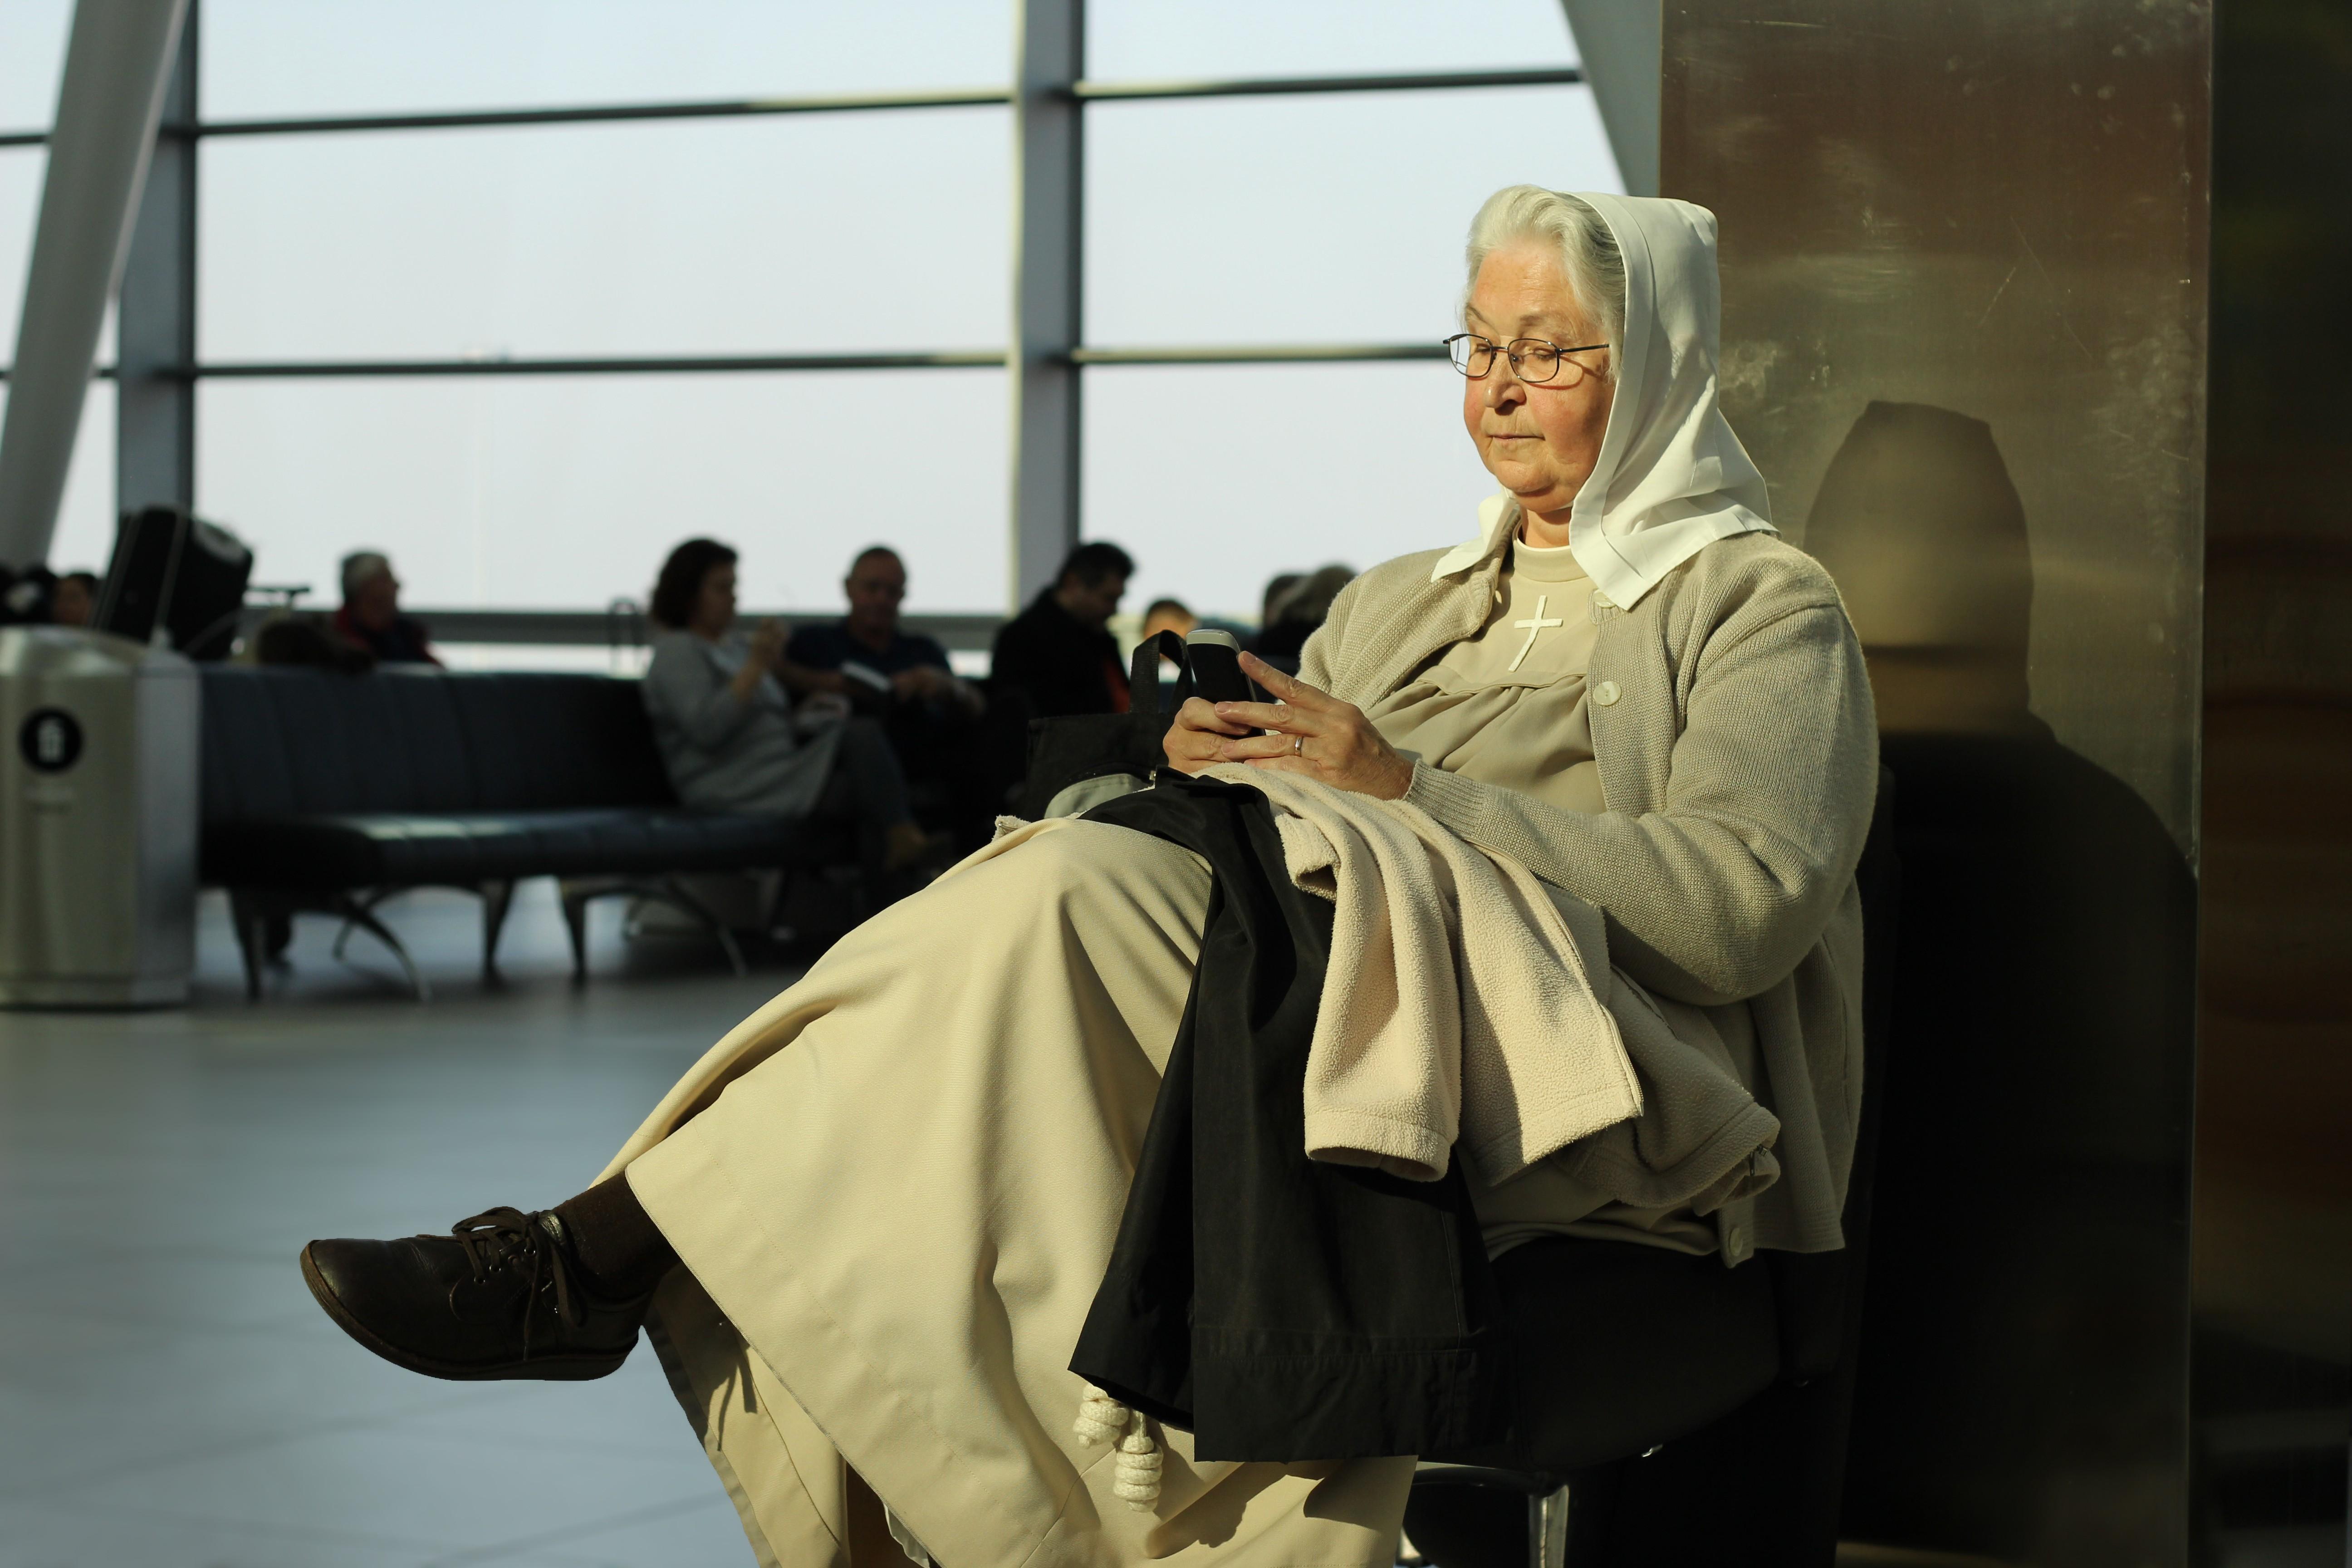 «Монахиня в аэропорту». Автор csababernath